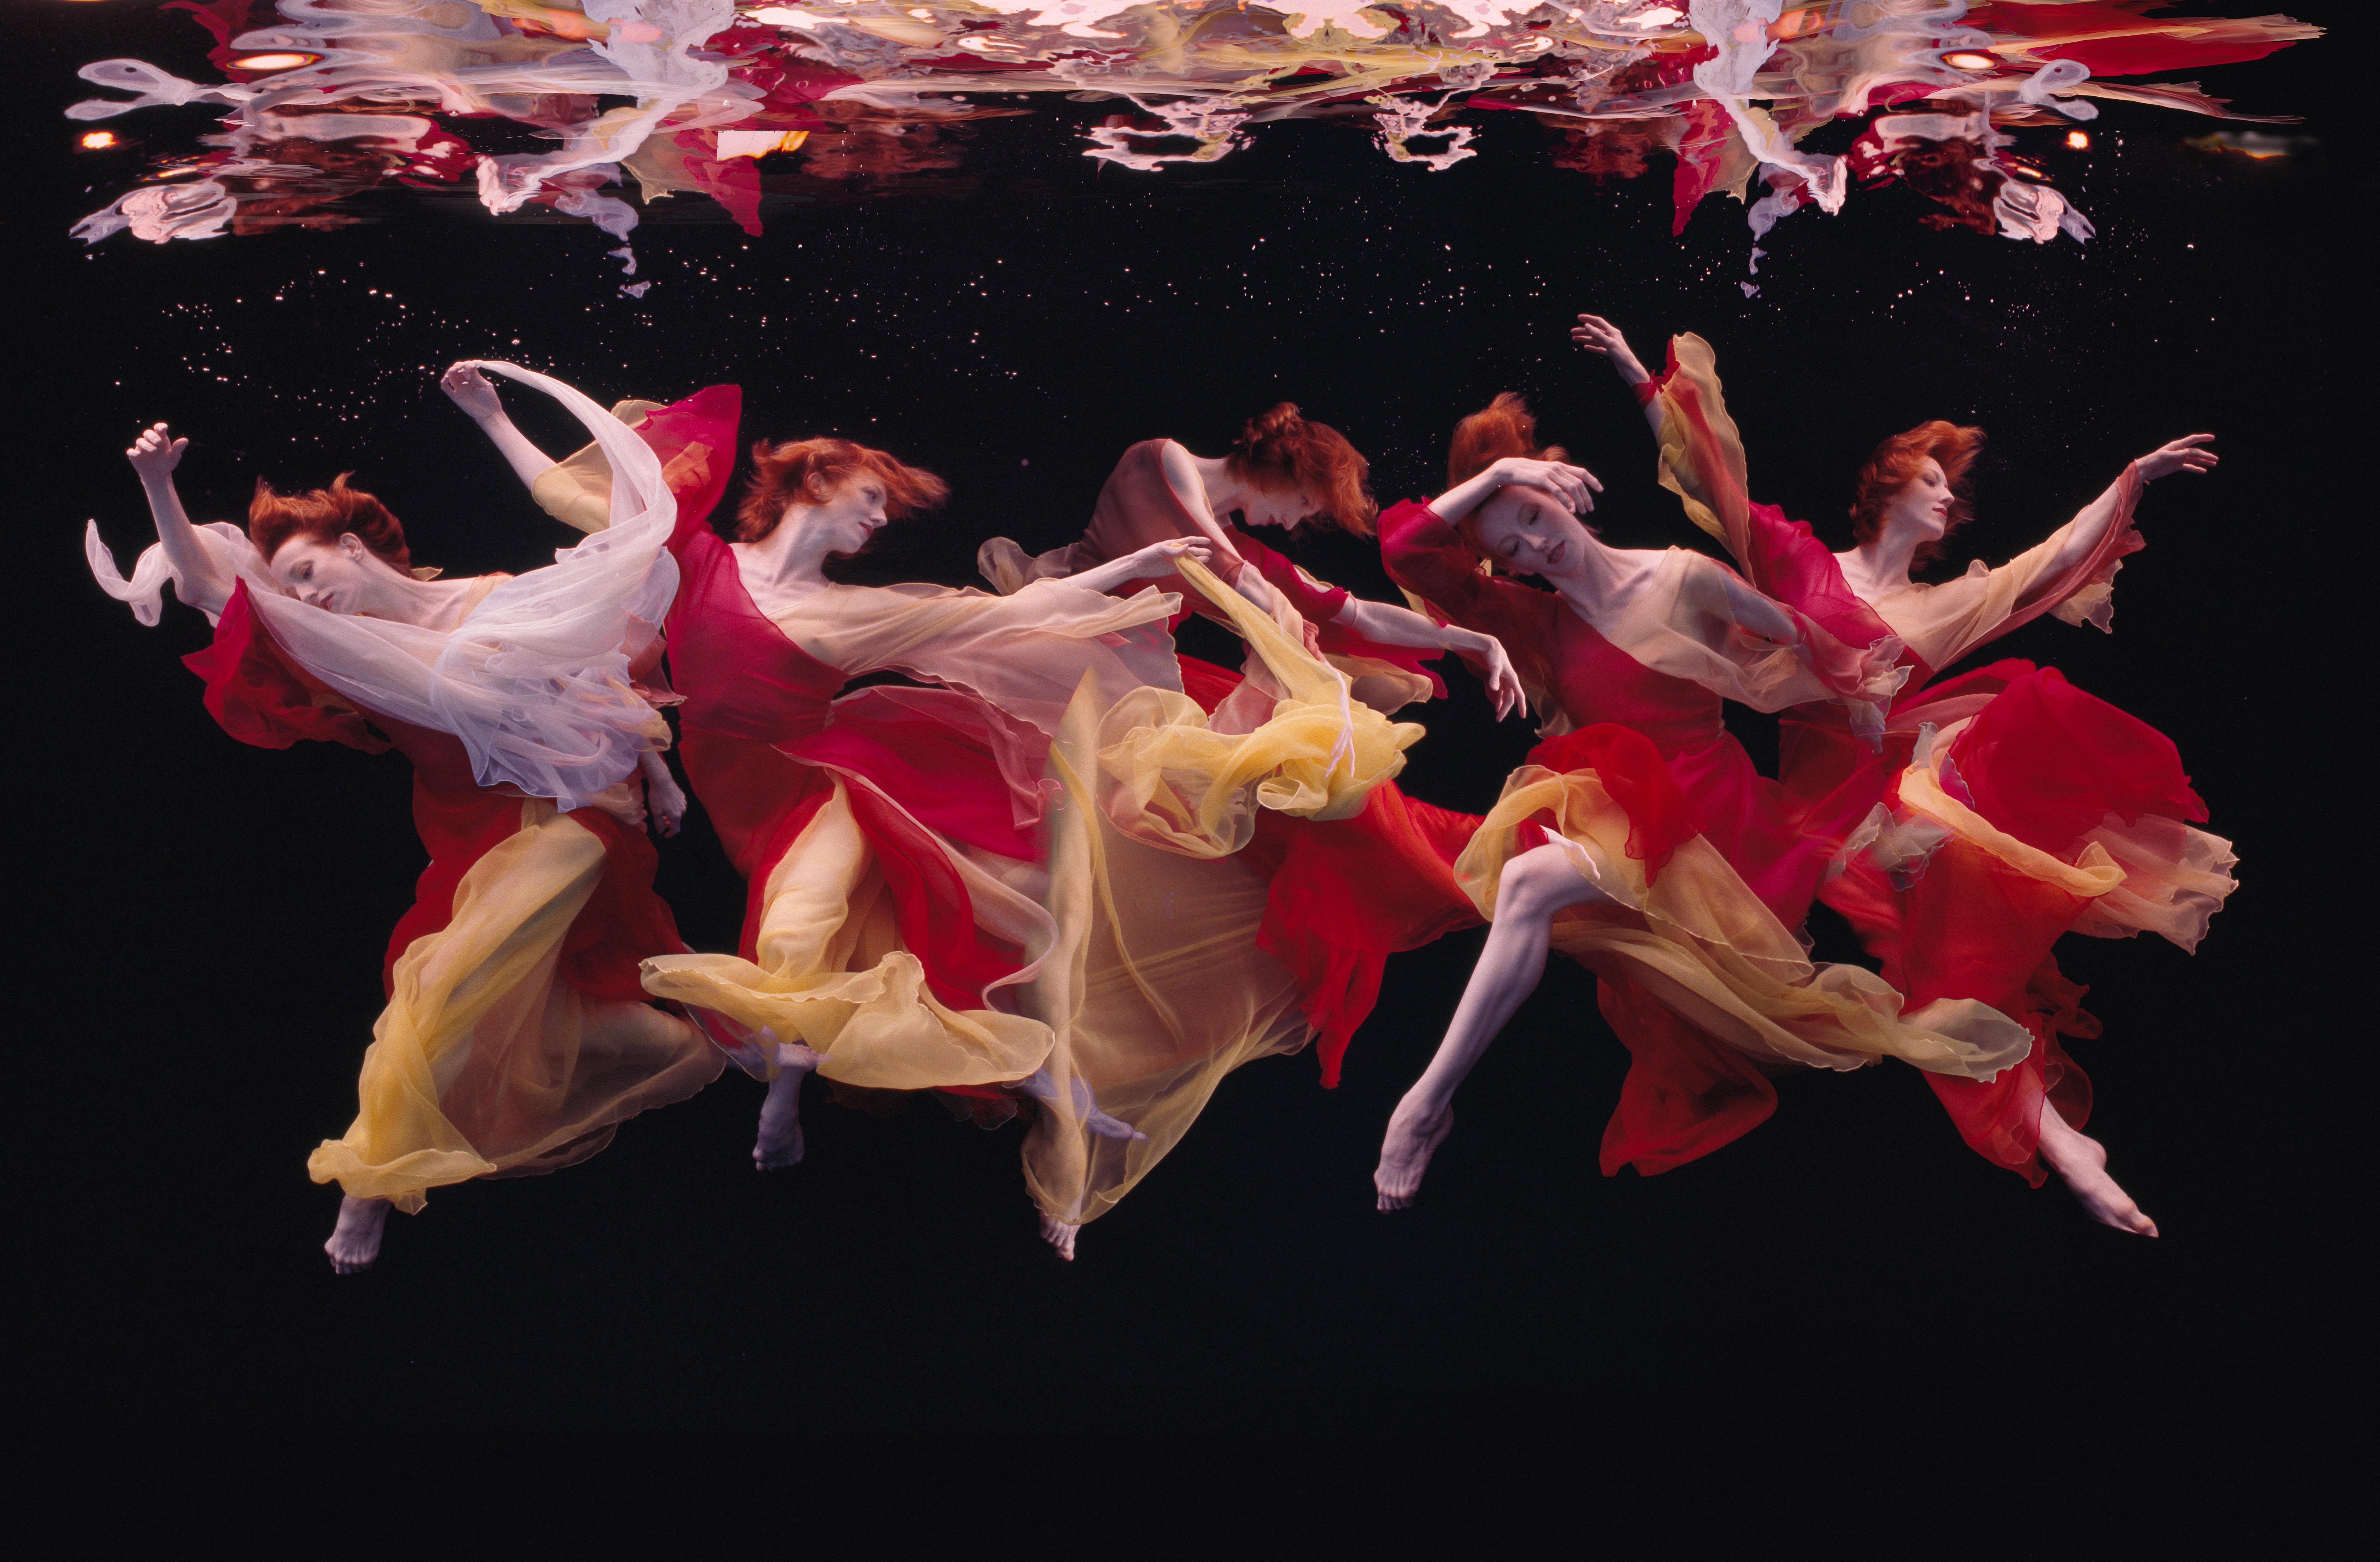 Underwater Study 3286